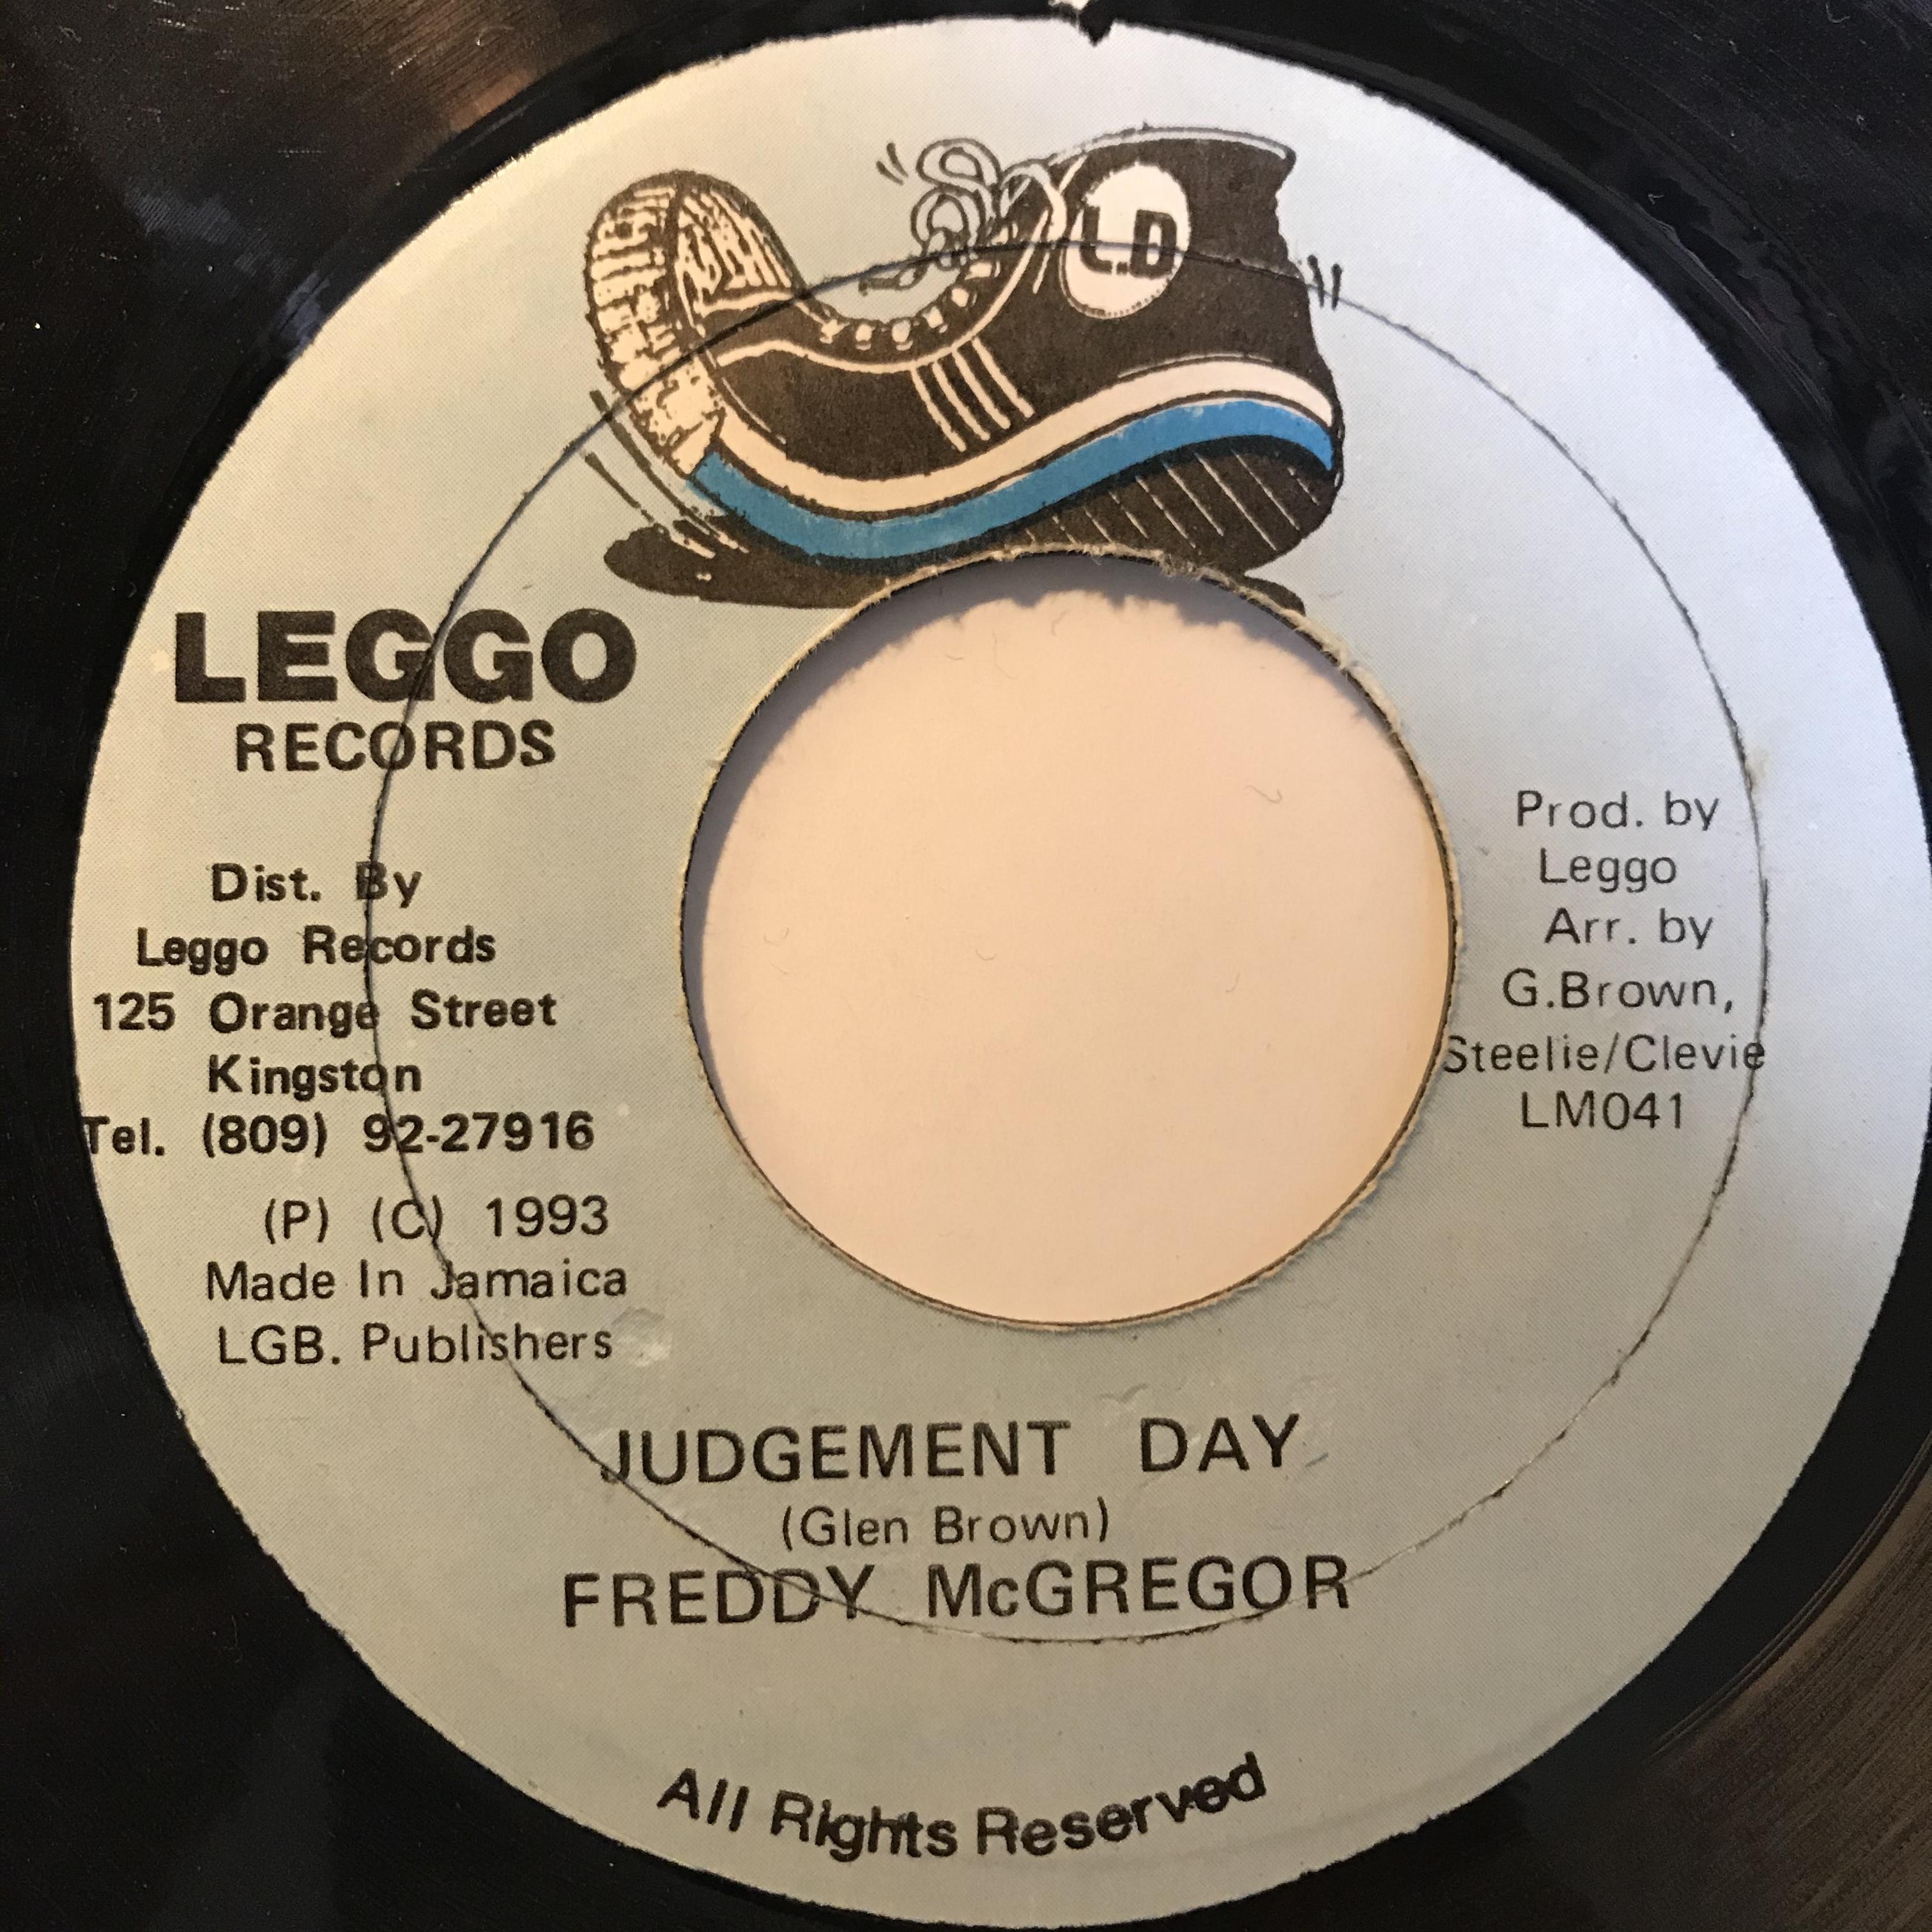 Freddy McGregor - Judgement Day【7-10815】